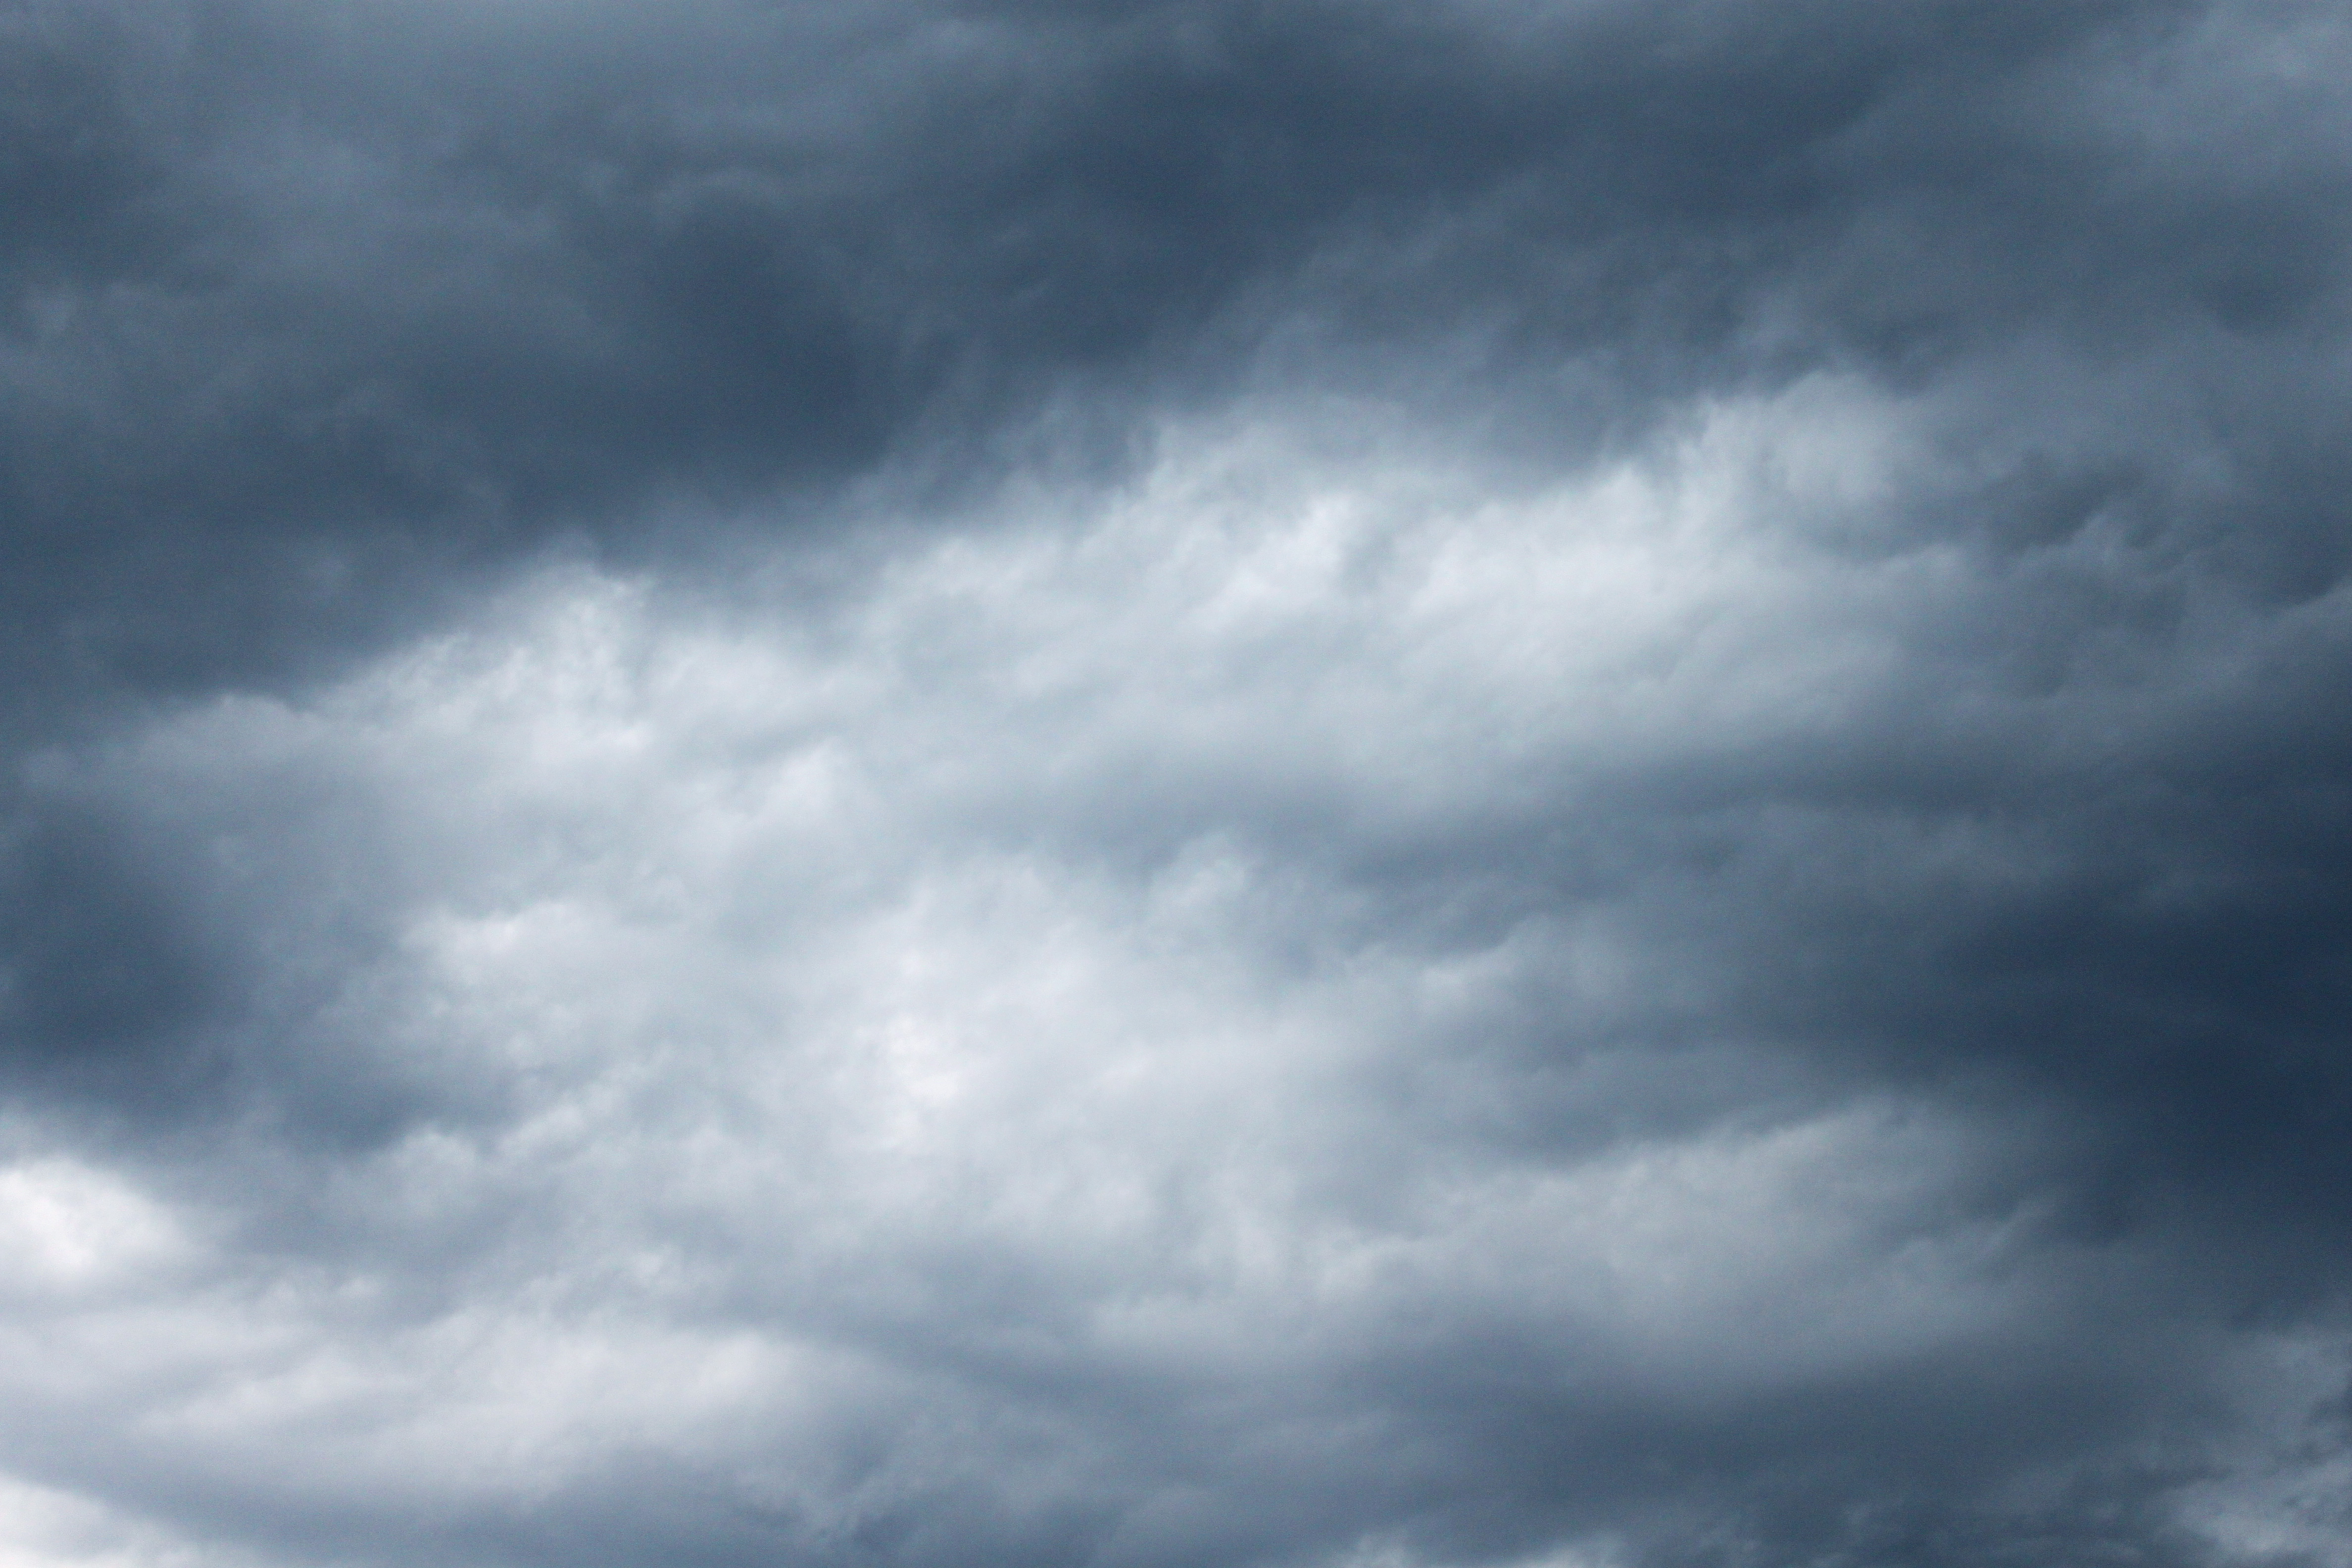 image Manipulation of the sky im high